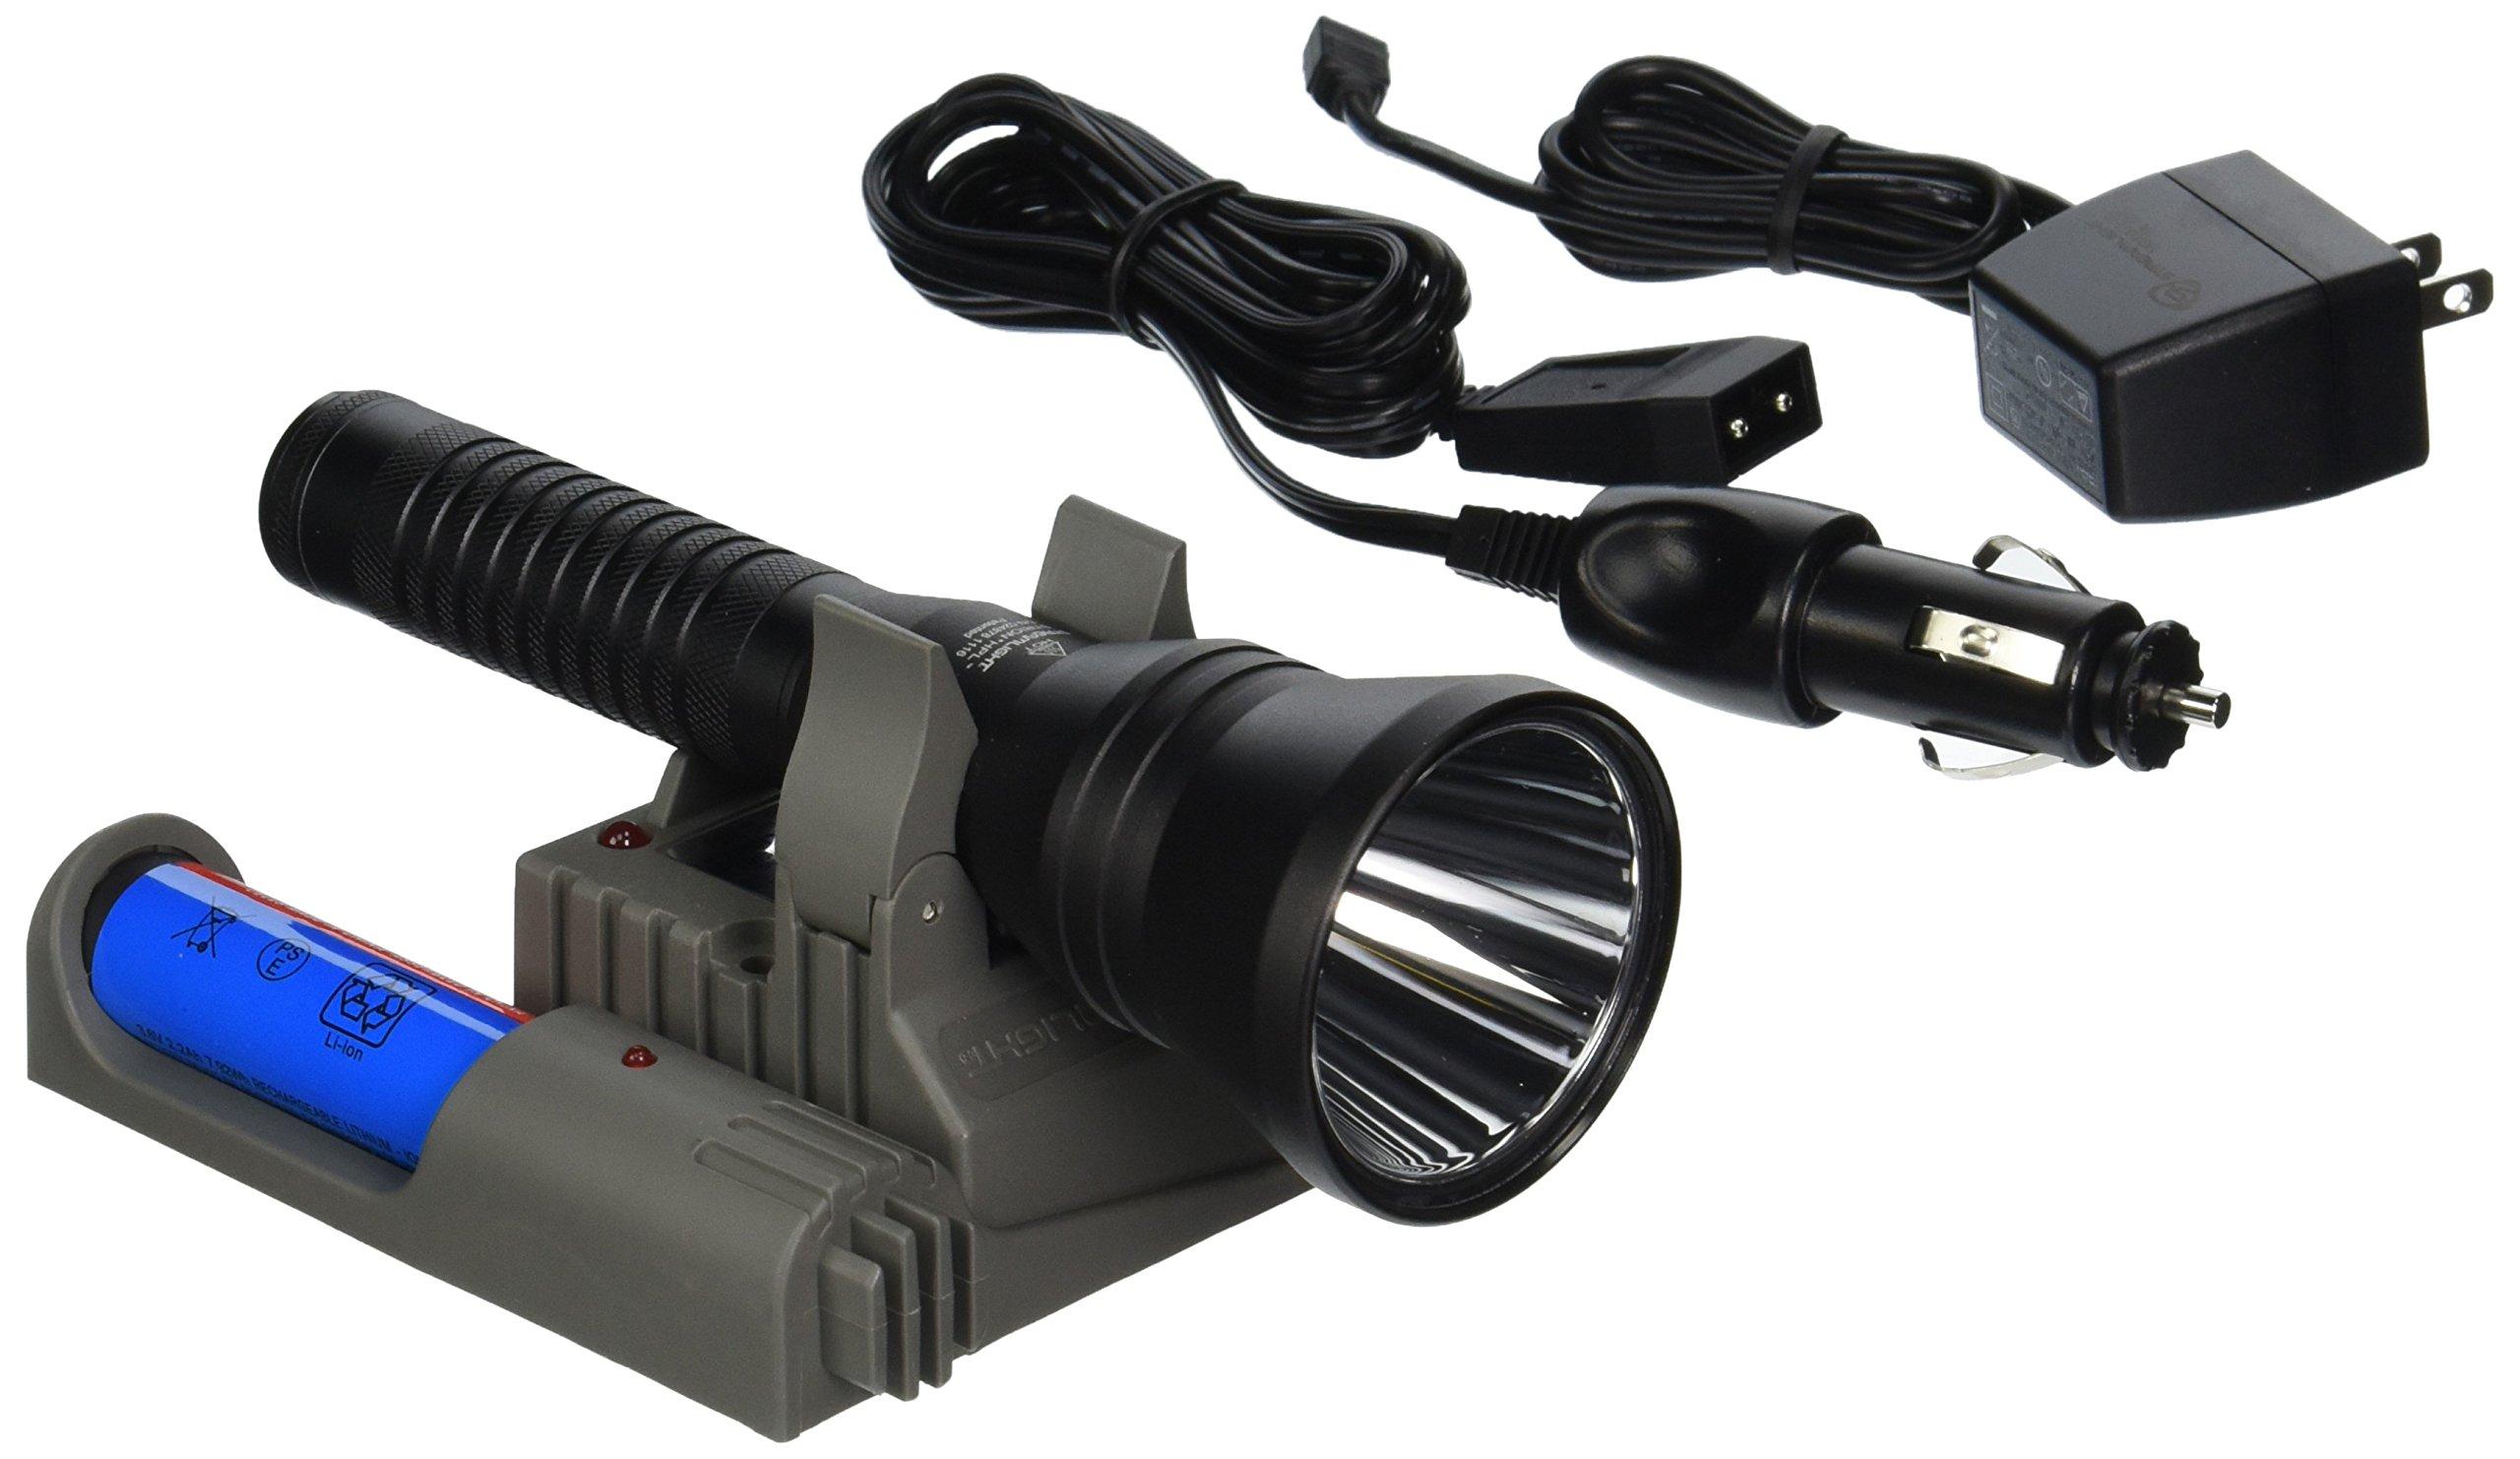 Streamlight 74536 Strion HPL Flashlight with 120V AC/12V DC Piggyback Charger